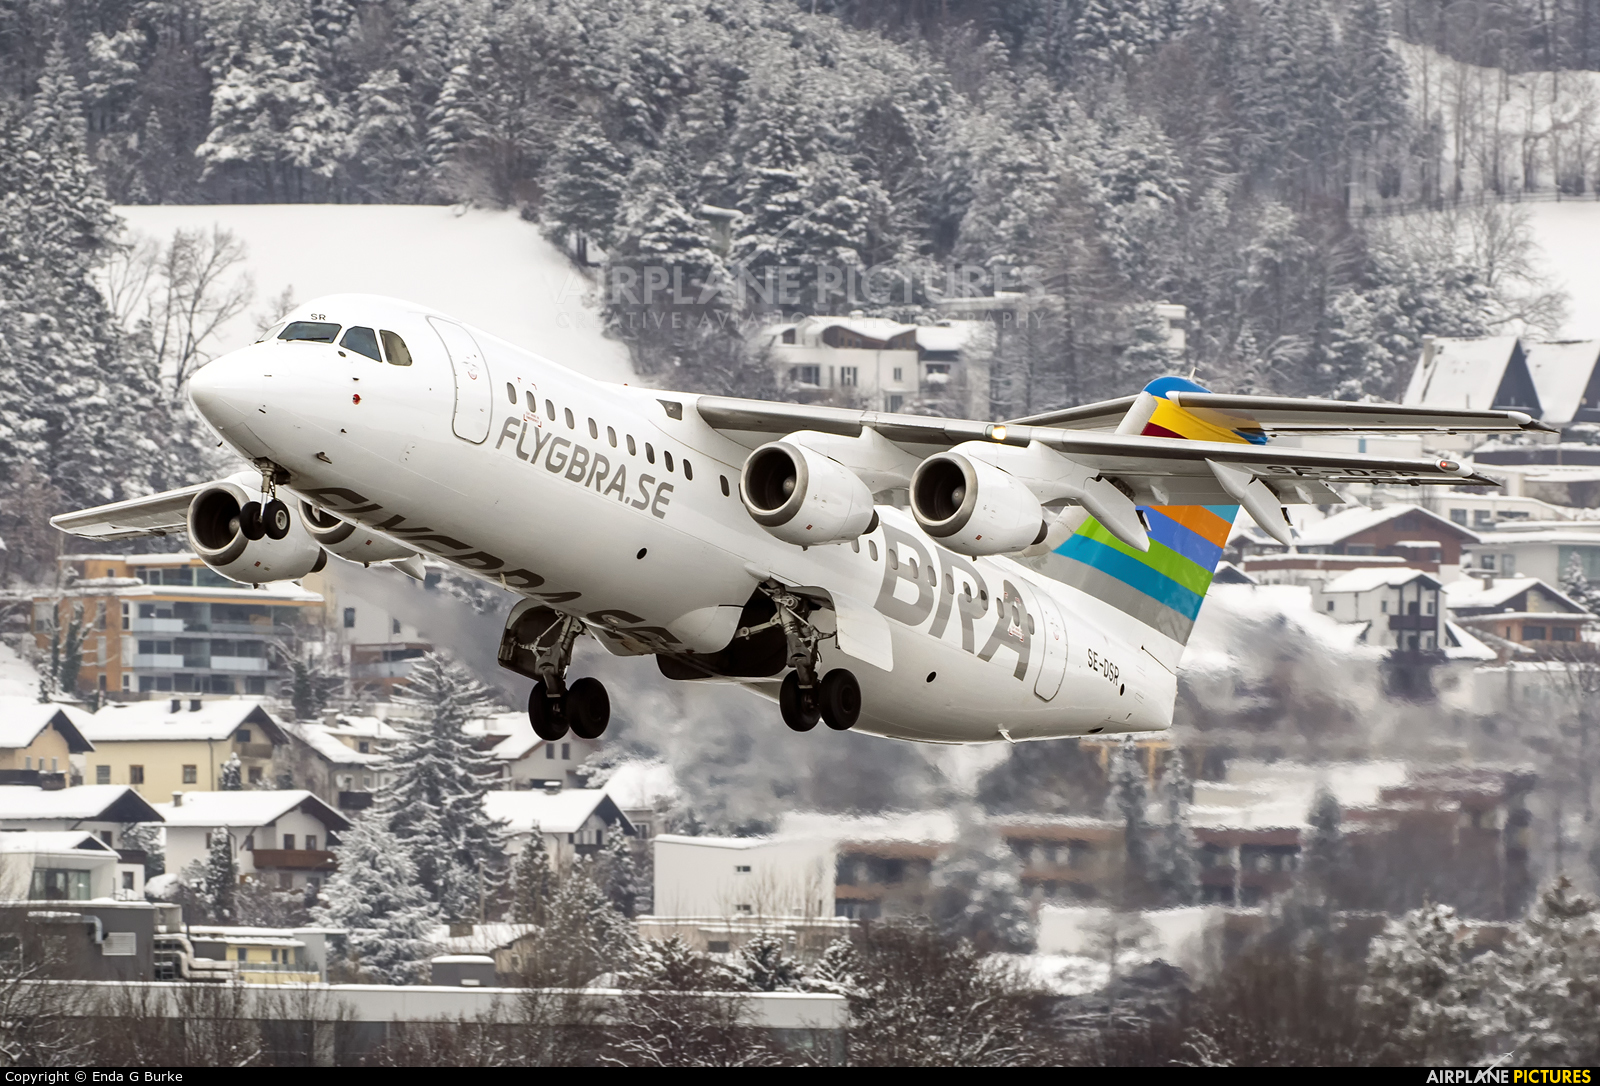 BRA (Sweden) SE-DSR aircraft at Innsbruck